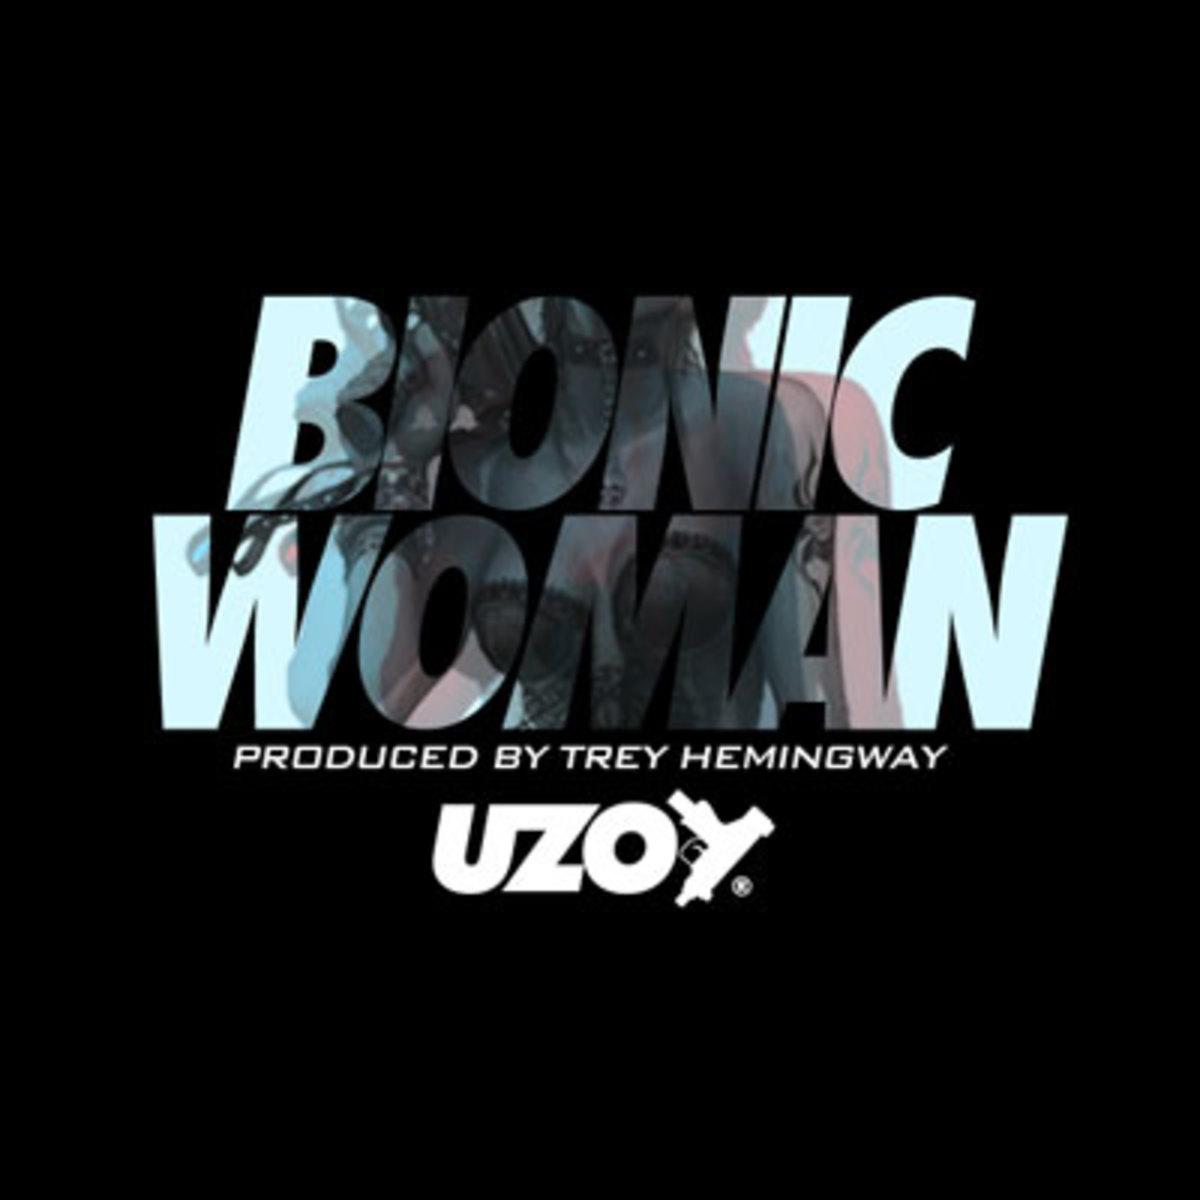 uzoy-bionicwoman.jpg